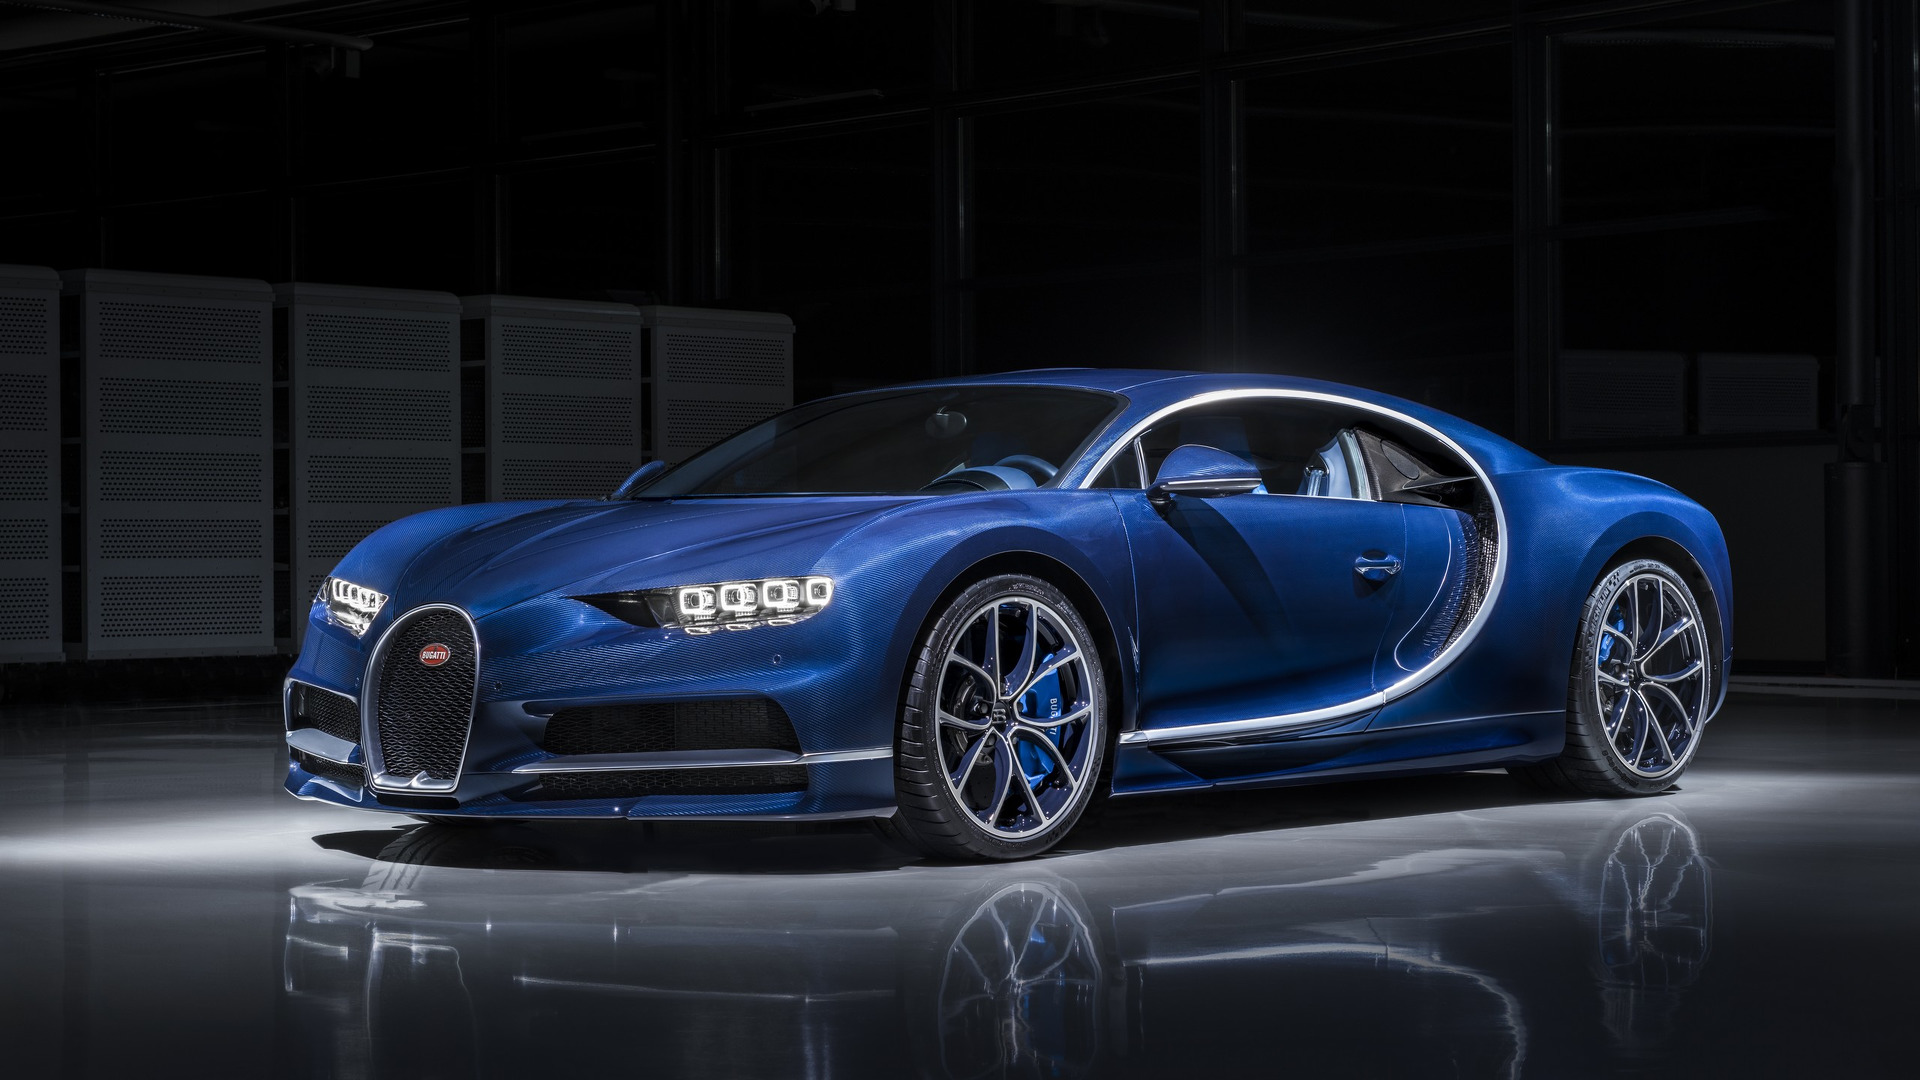 Bugatti Chiron In Bleu Royal Exposed Carbon Fibre Will